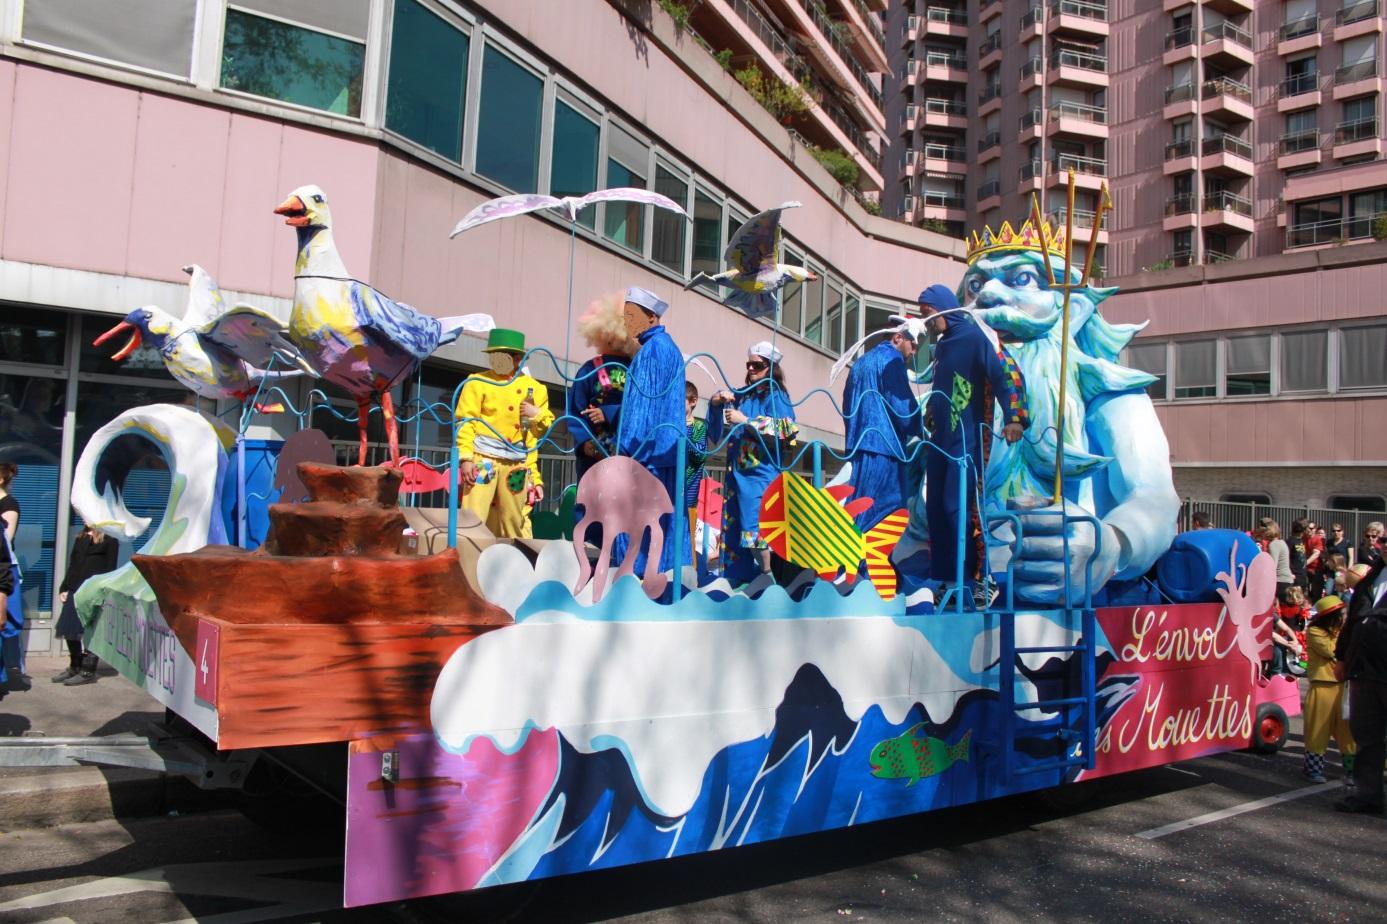 enfance carnaval de strasbourg dimanche 6 avril l envol des mouettes fondation vincent. Black Bedroom Furniture Sets. Home Design Ideas